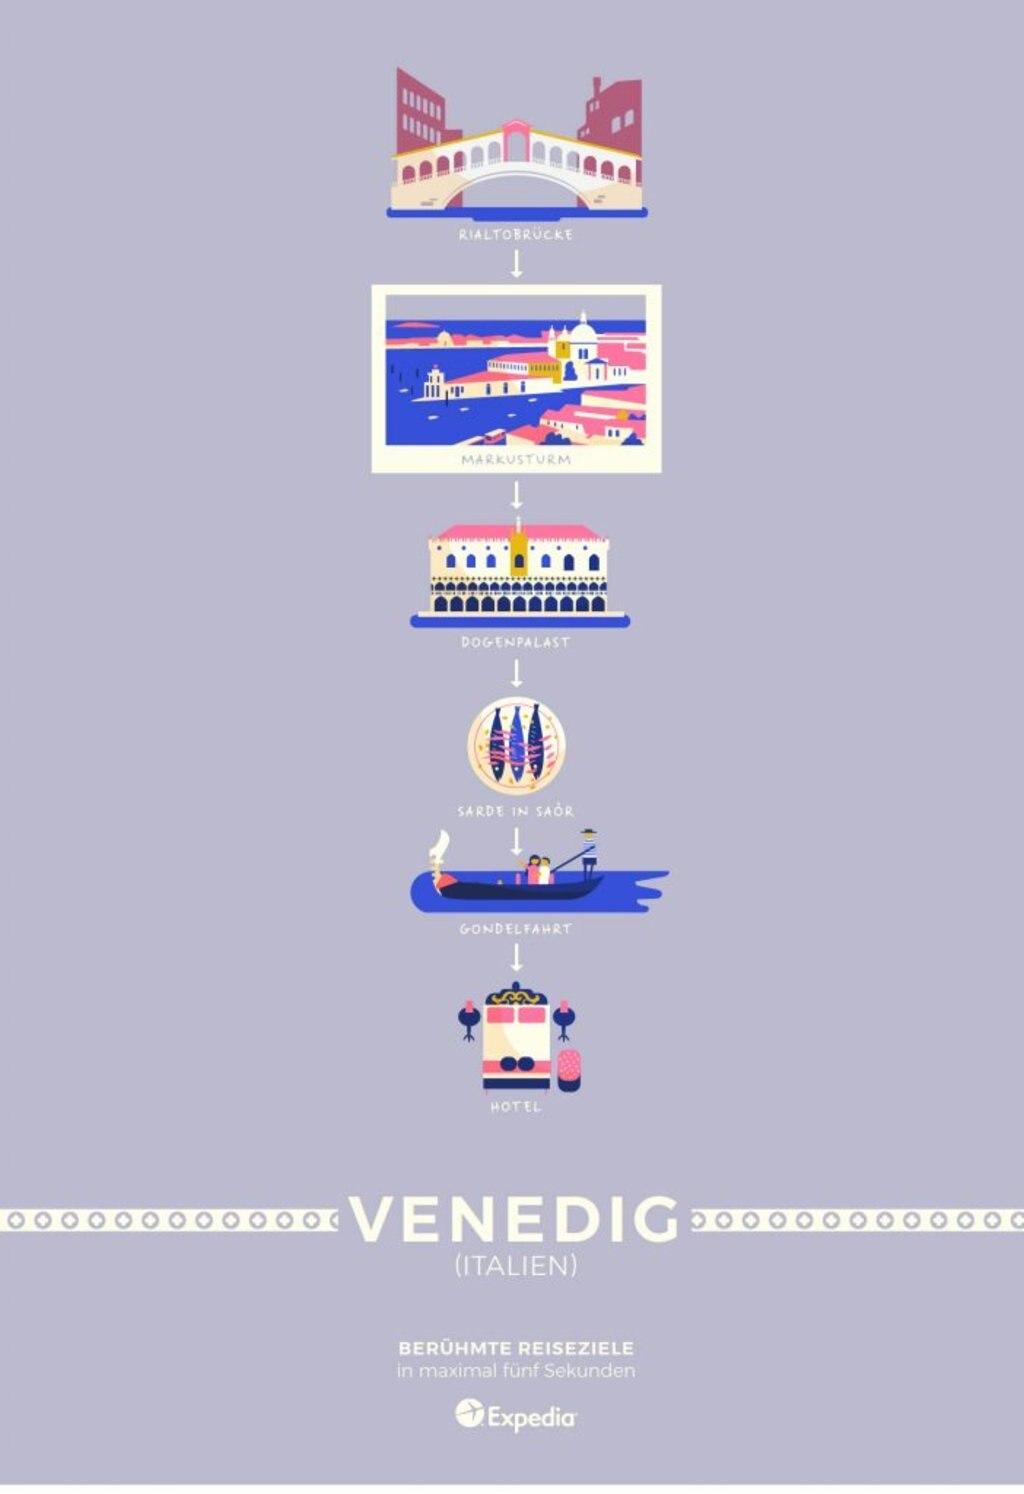 Reiseziele in 5 Sekunden: Venedig